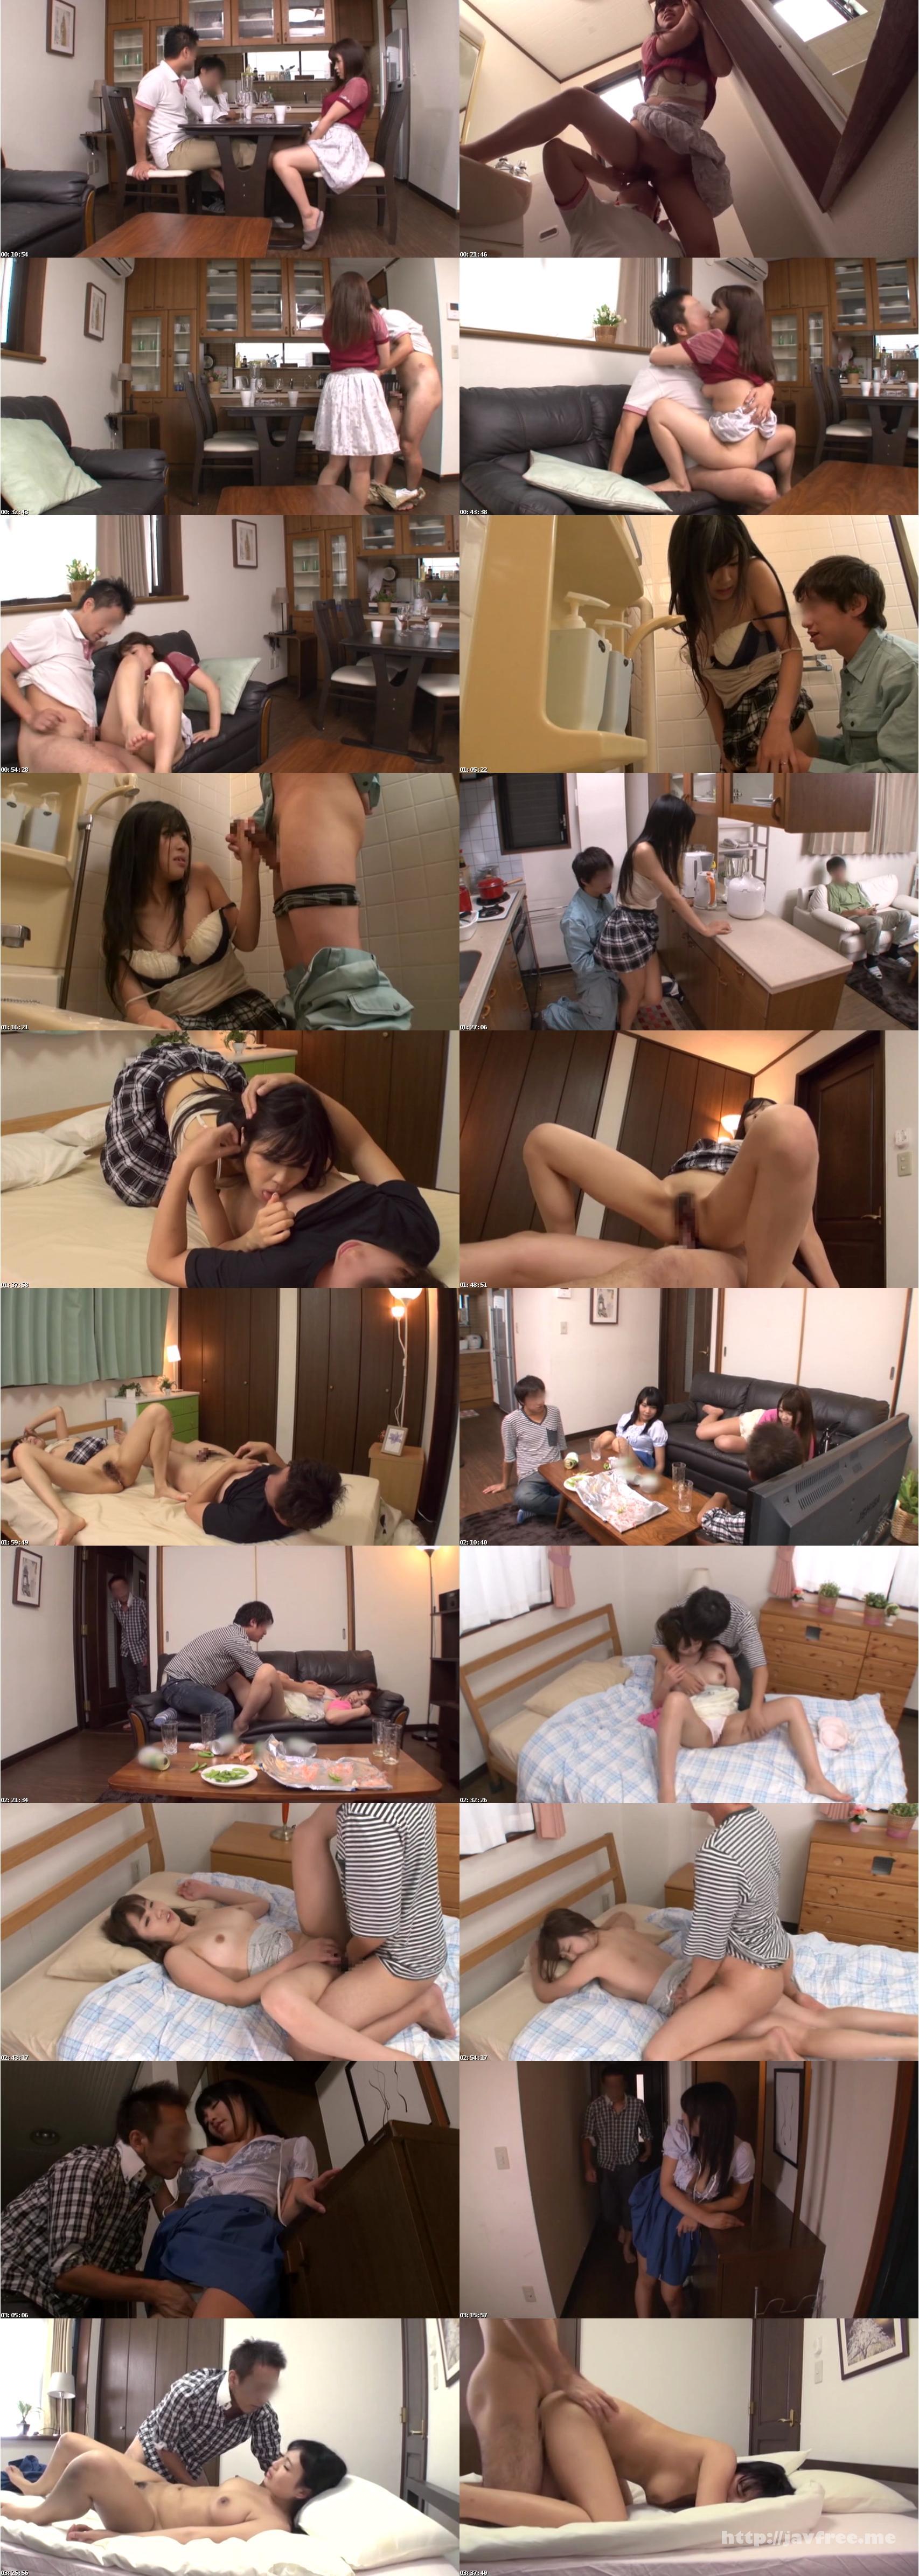 [SCOP 347] 「自宅で妻を寝取って下さい」愛する巨乳妻を別の男に寝取らせ次第に濡れ始めイキまくる妻を目の前にして興奮する夫 SCOP